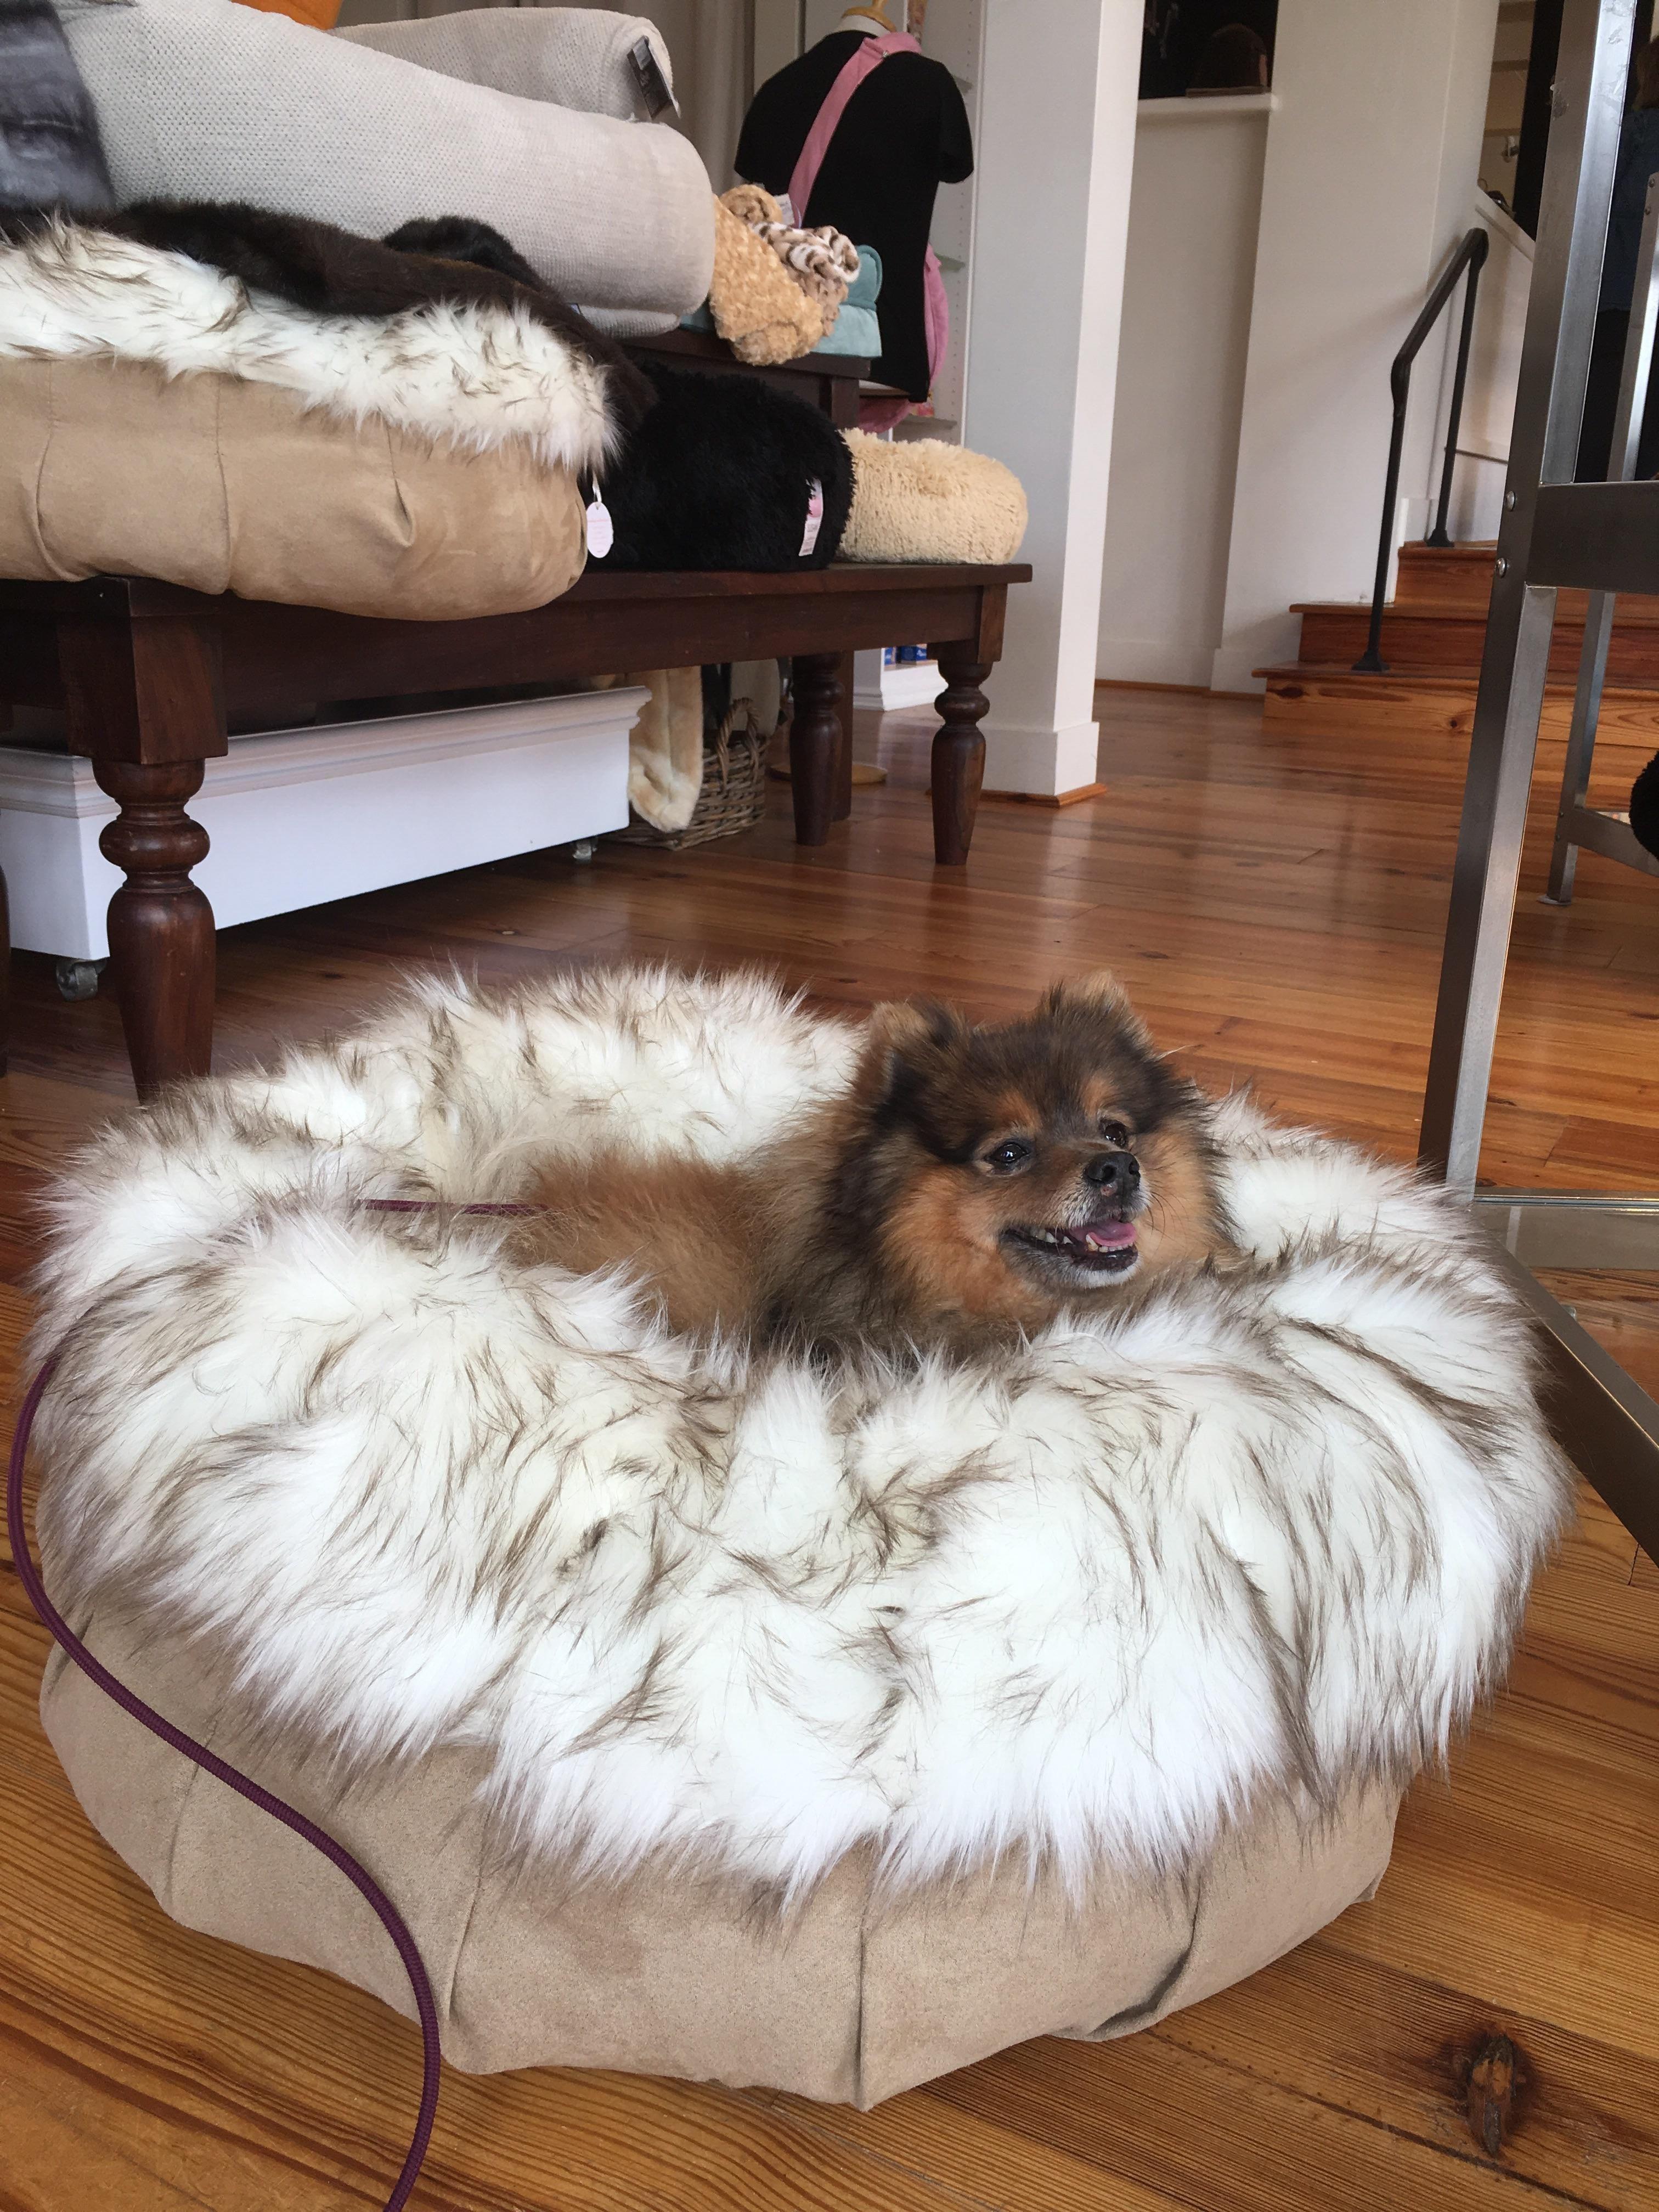 A fluffy pup in a fluffy puff #Cute